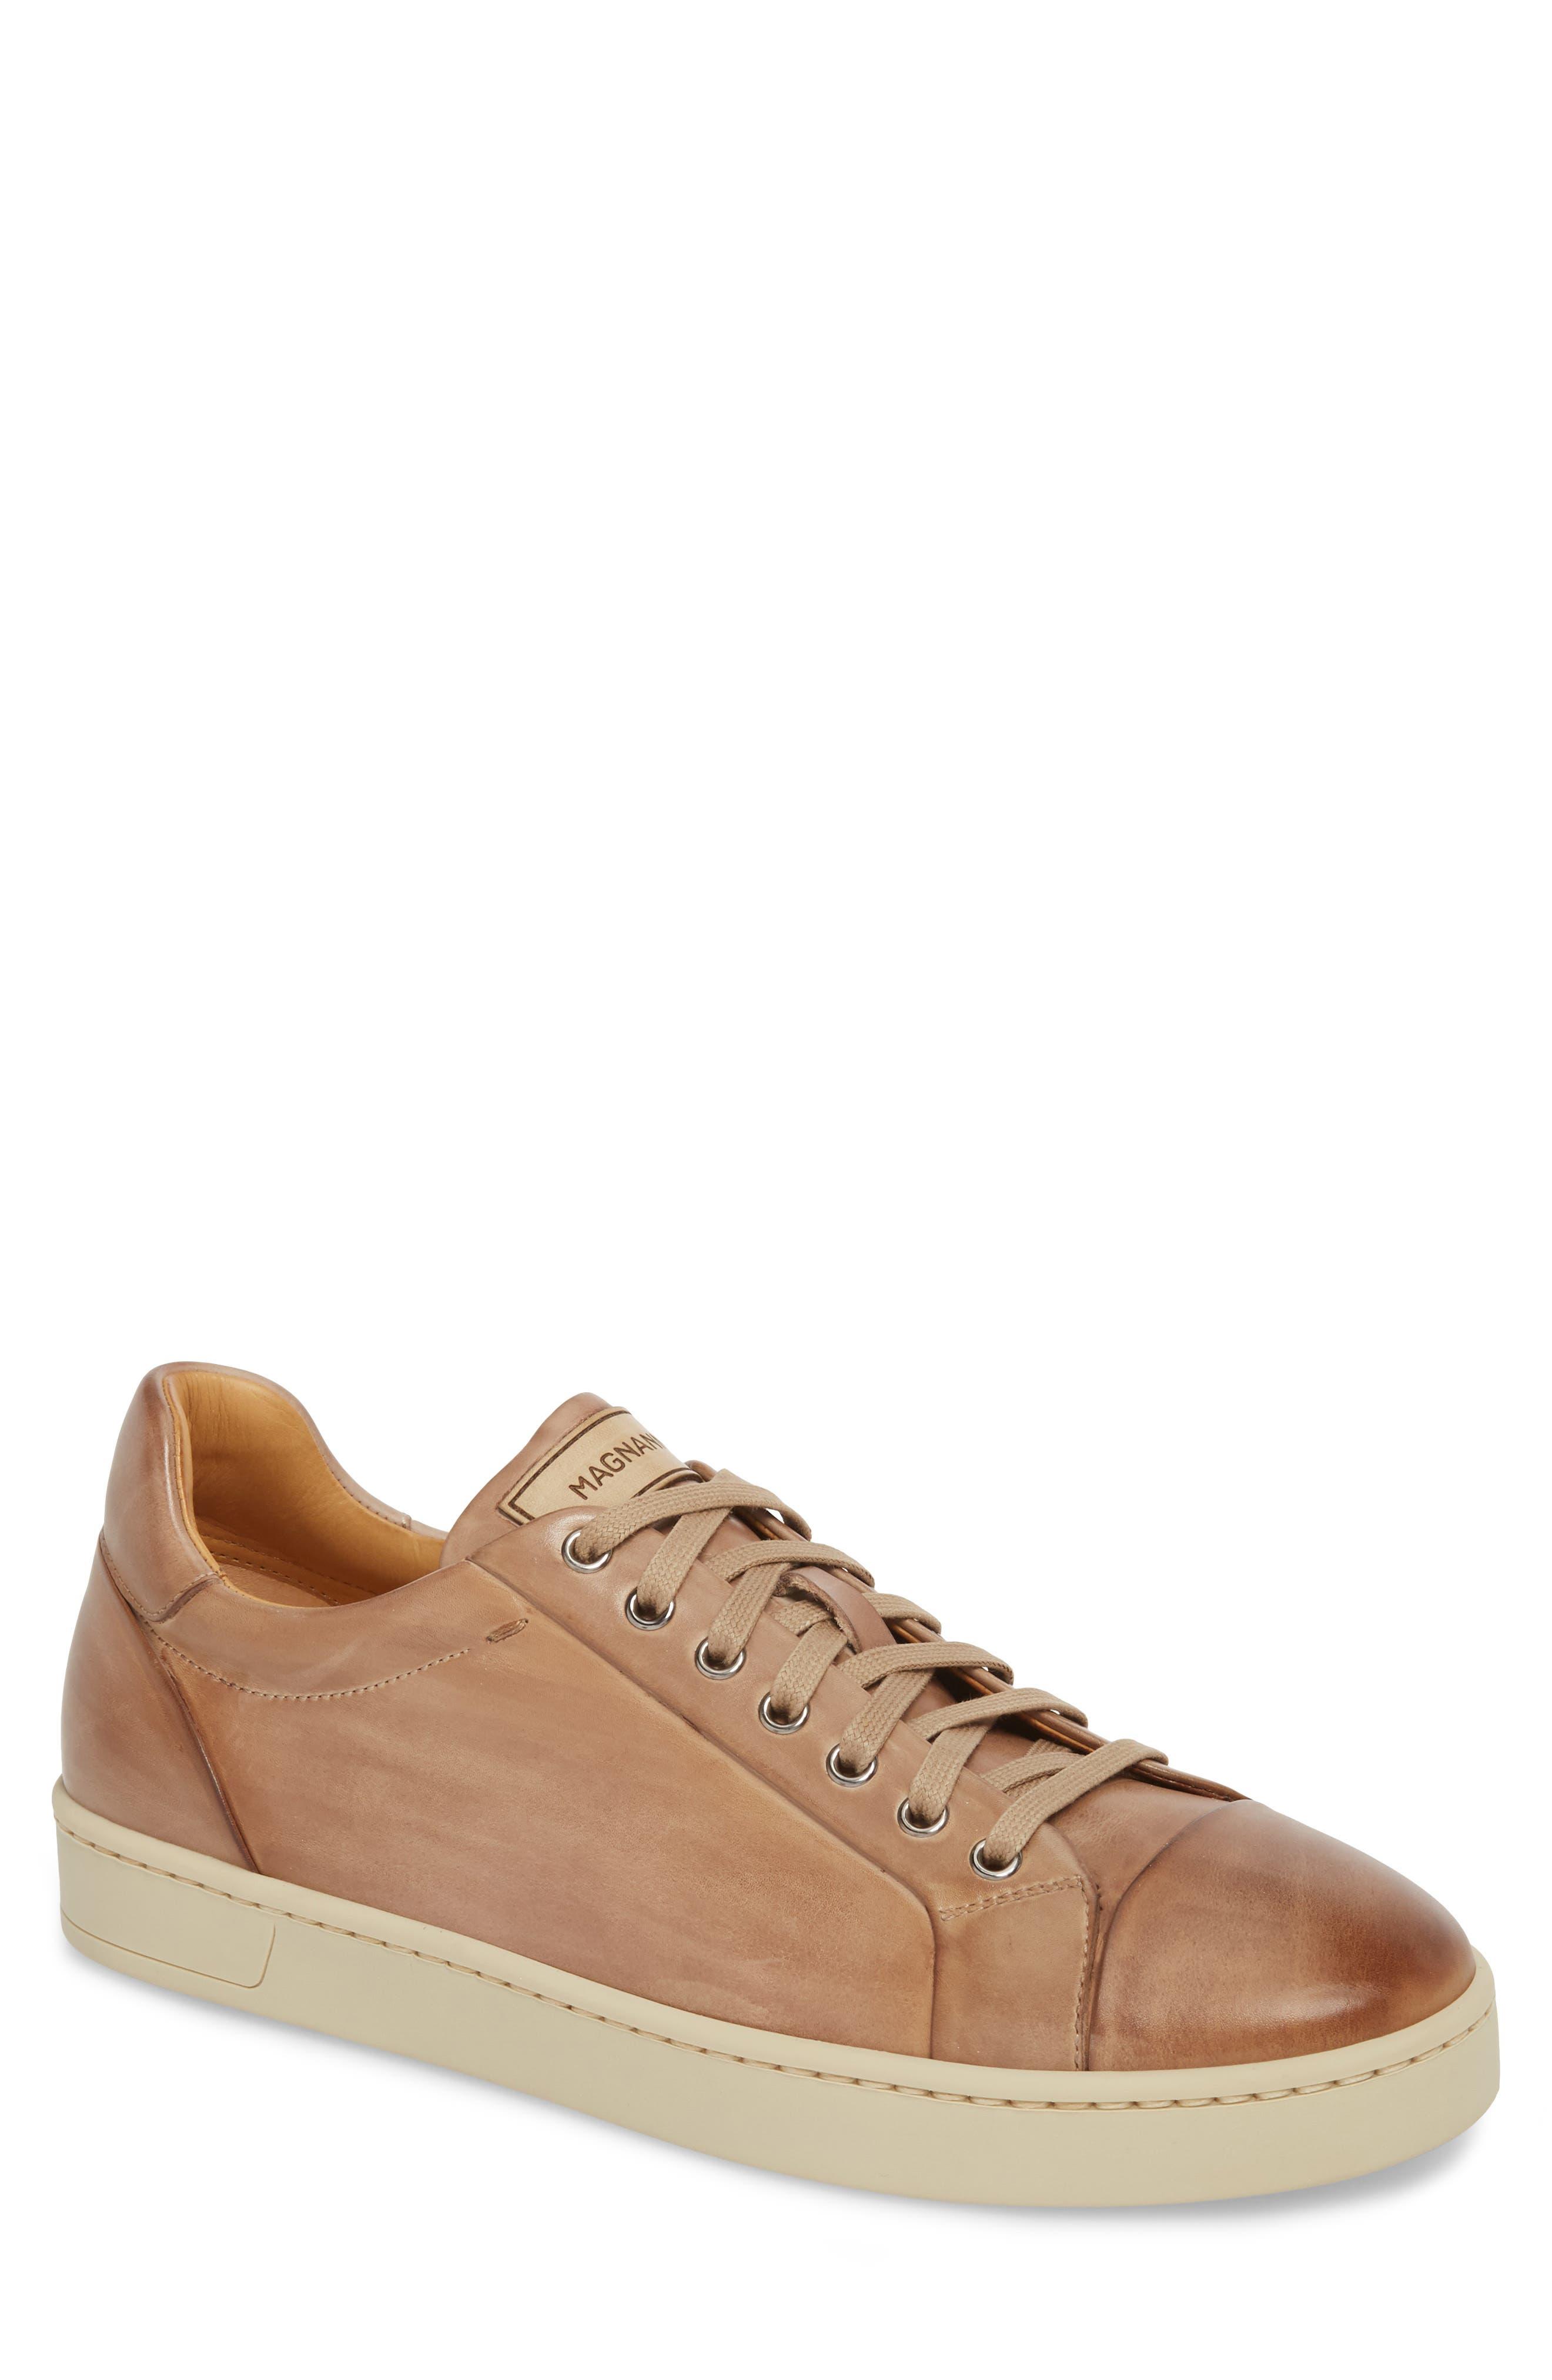 Erardo Low Top Sneaker,                         Main,                         color, 251